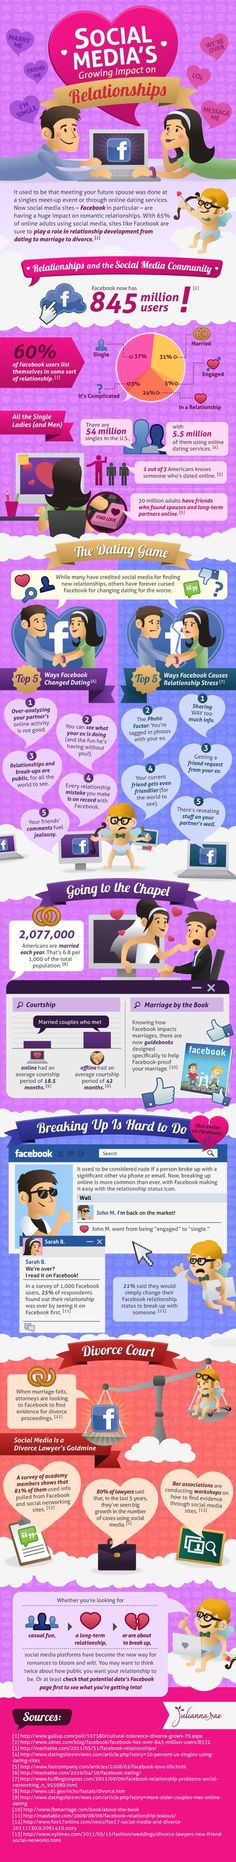 Social media's growing impact on